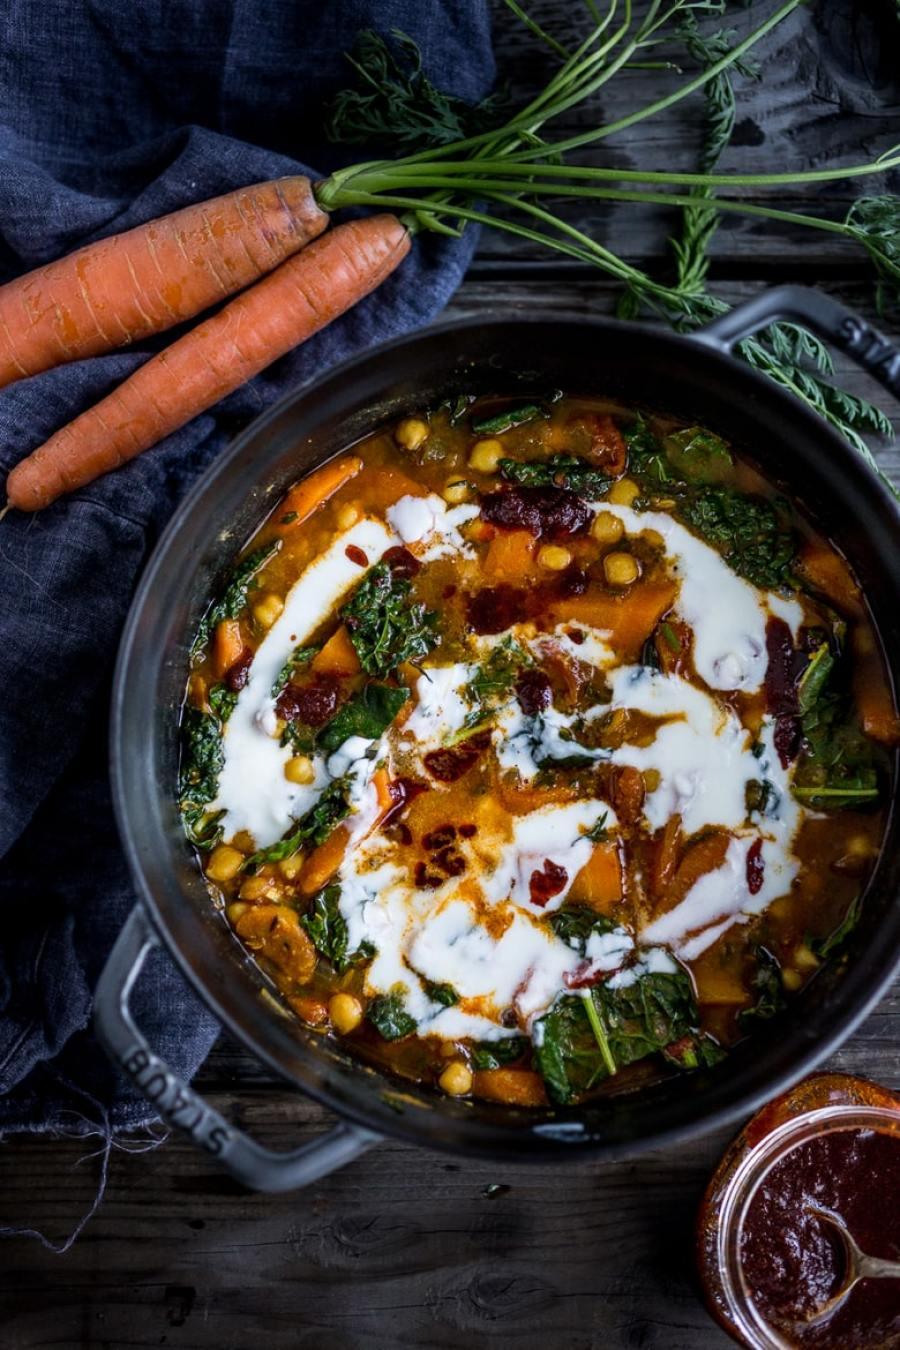 Tunisian Chickpea Stew with Carrots, turmeric, harissa and Yogurt!